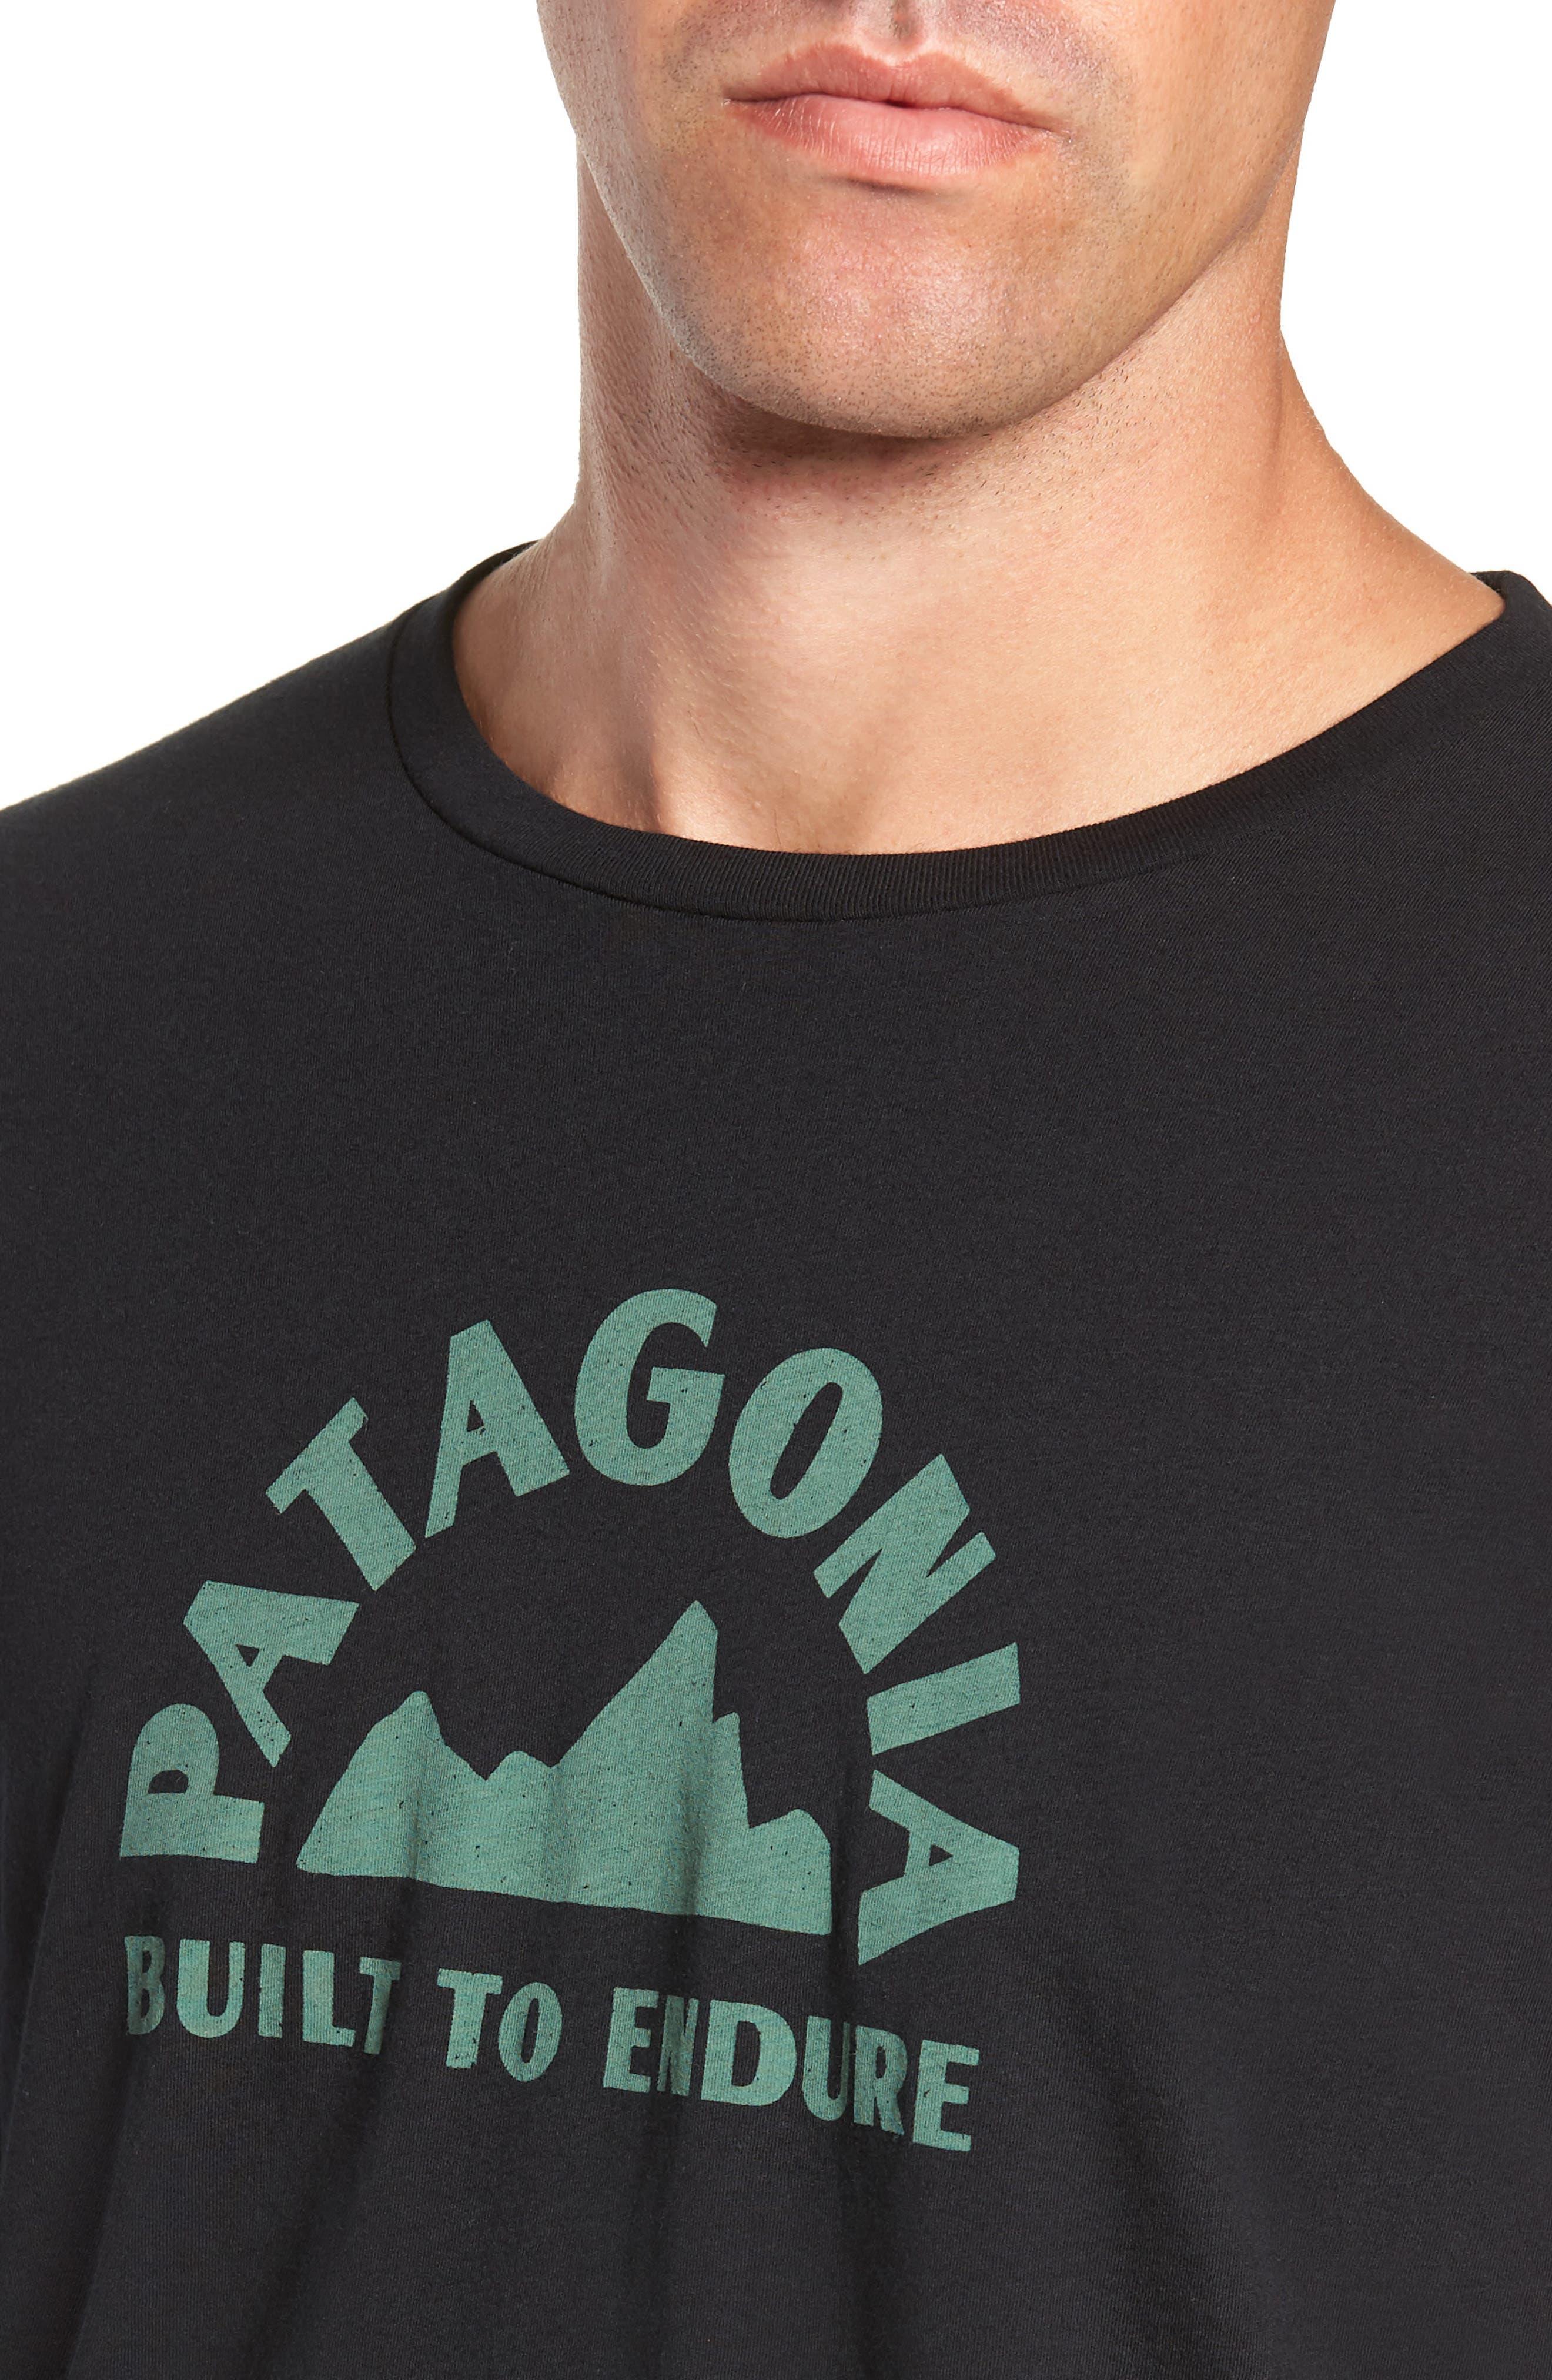 Geologers Organic Cotton T-Shirt,                             Alternate thumbnail 4, color,                             BLACK